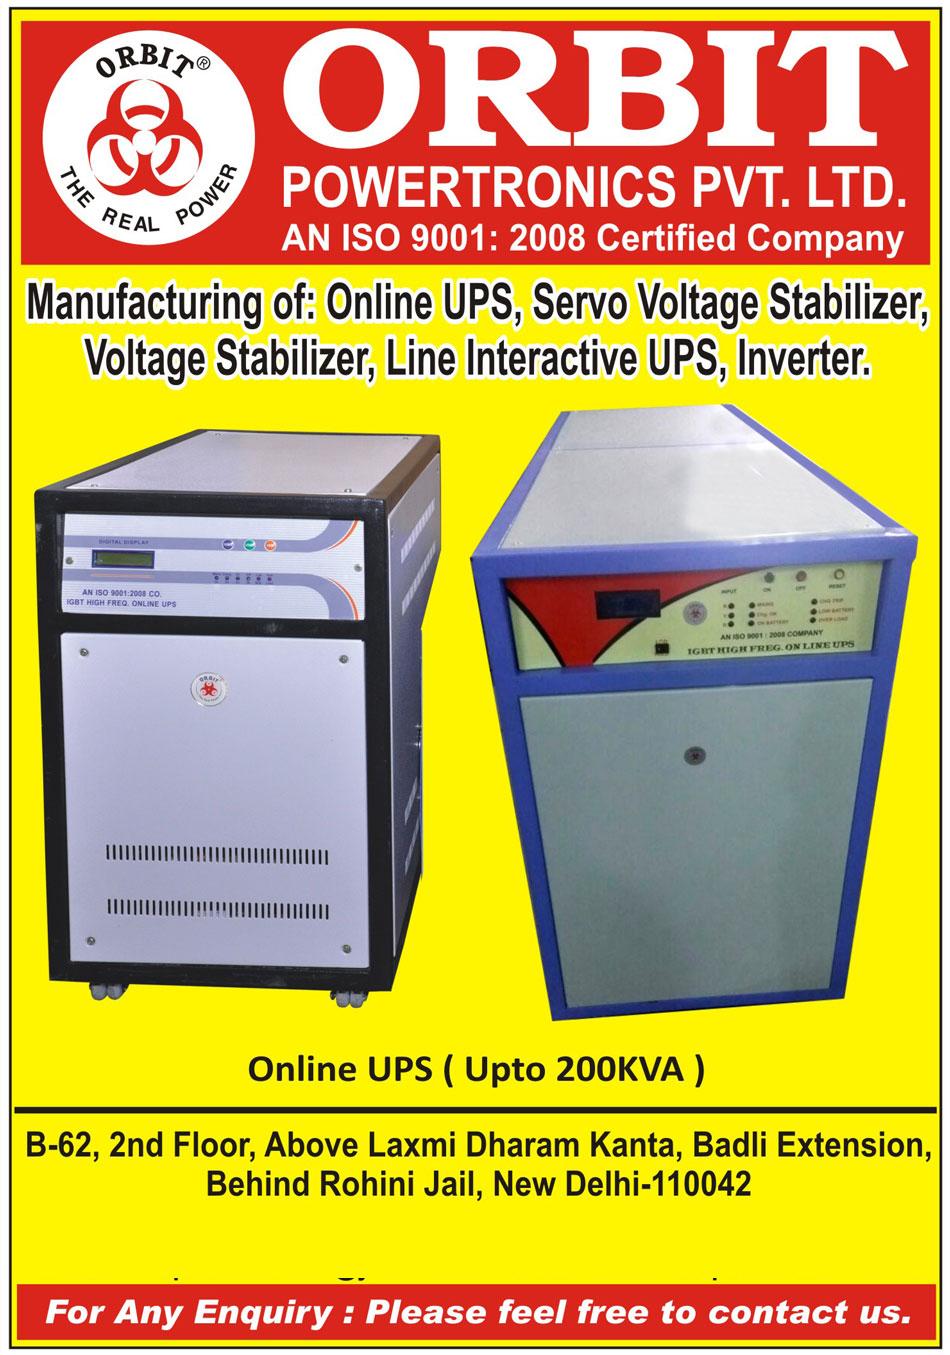 Online UPS, Servo Voltage Stabilizers, Voltage Stabilizers, Line Interactive UPS, Inverters,